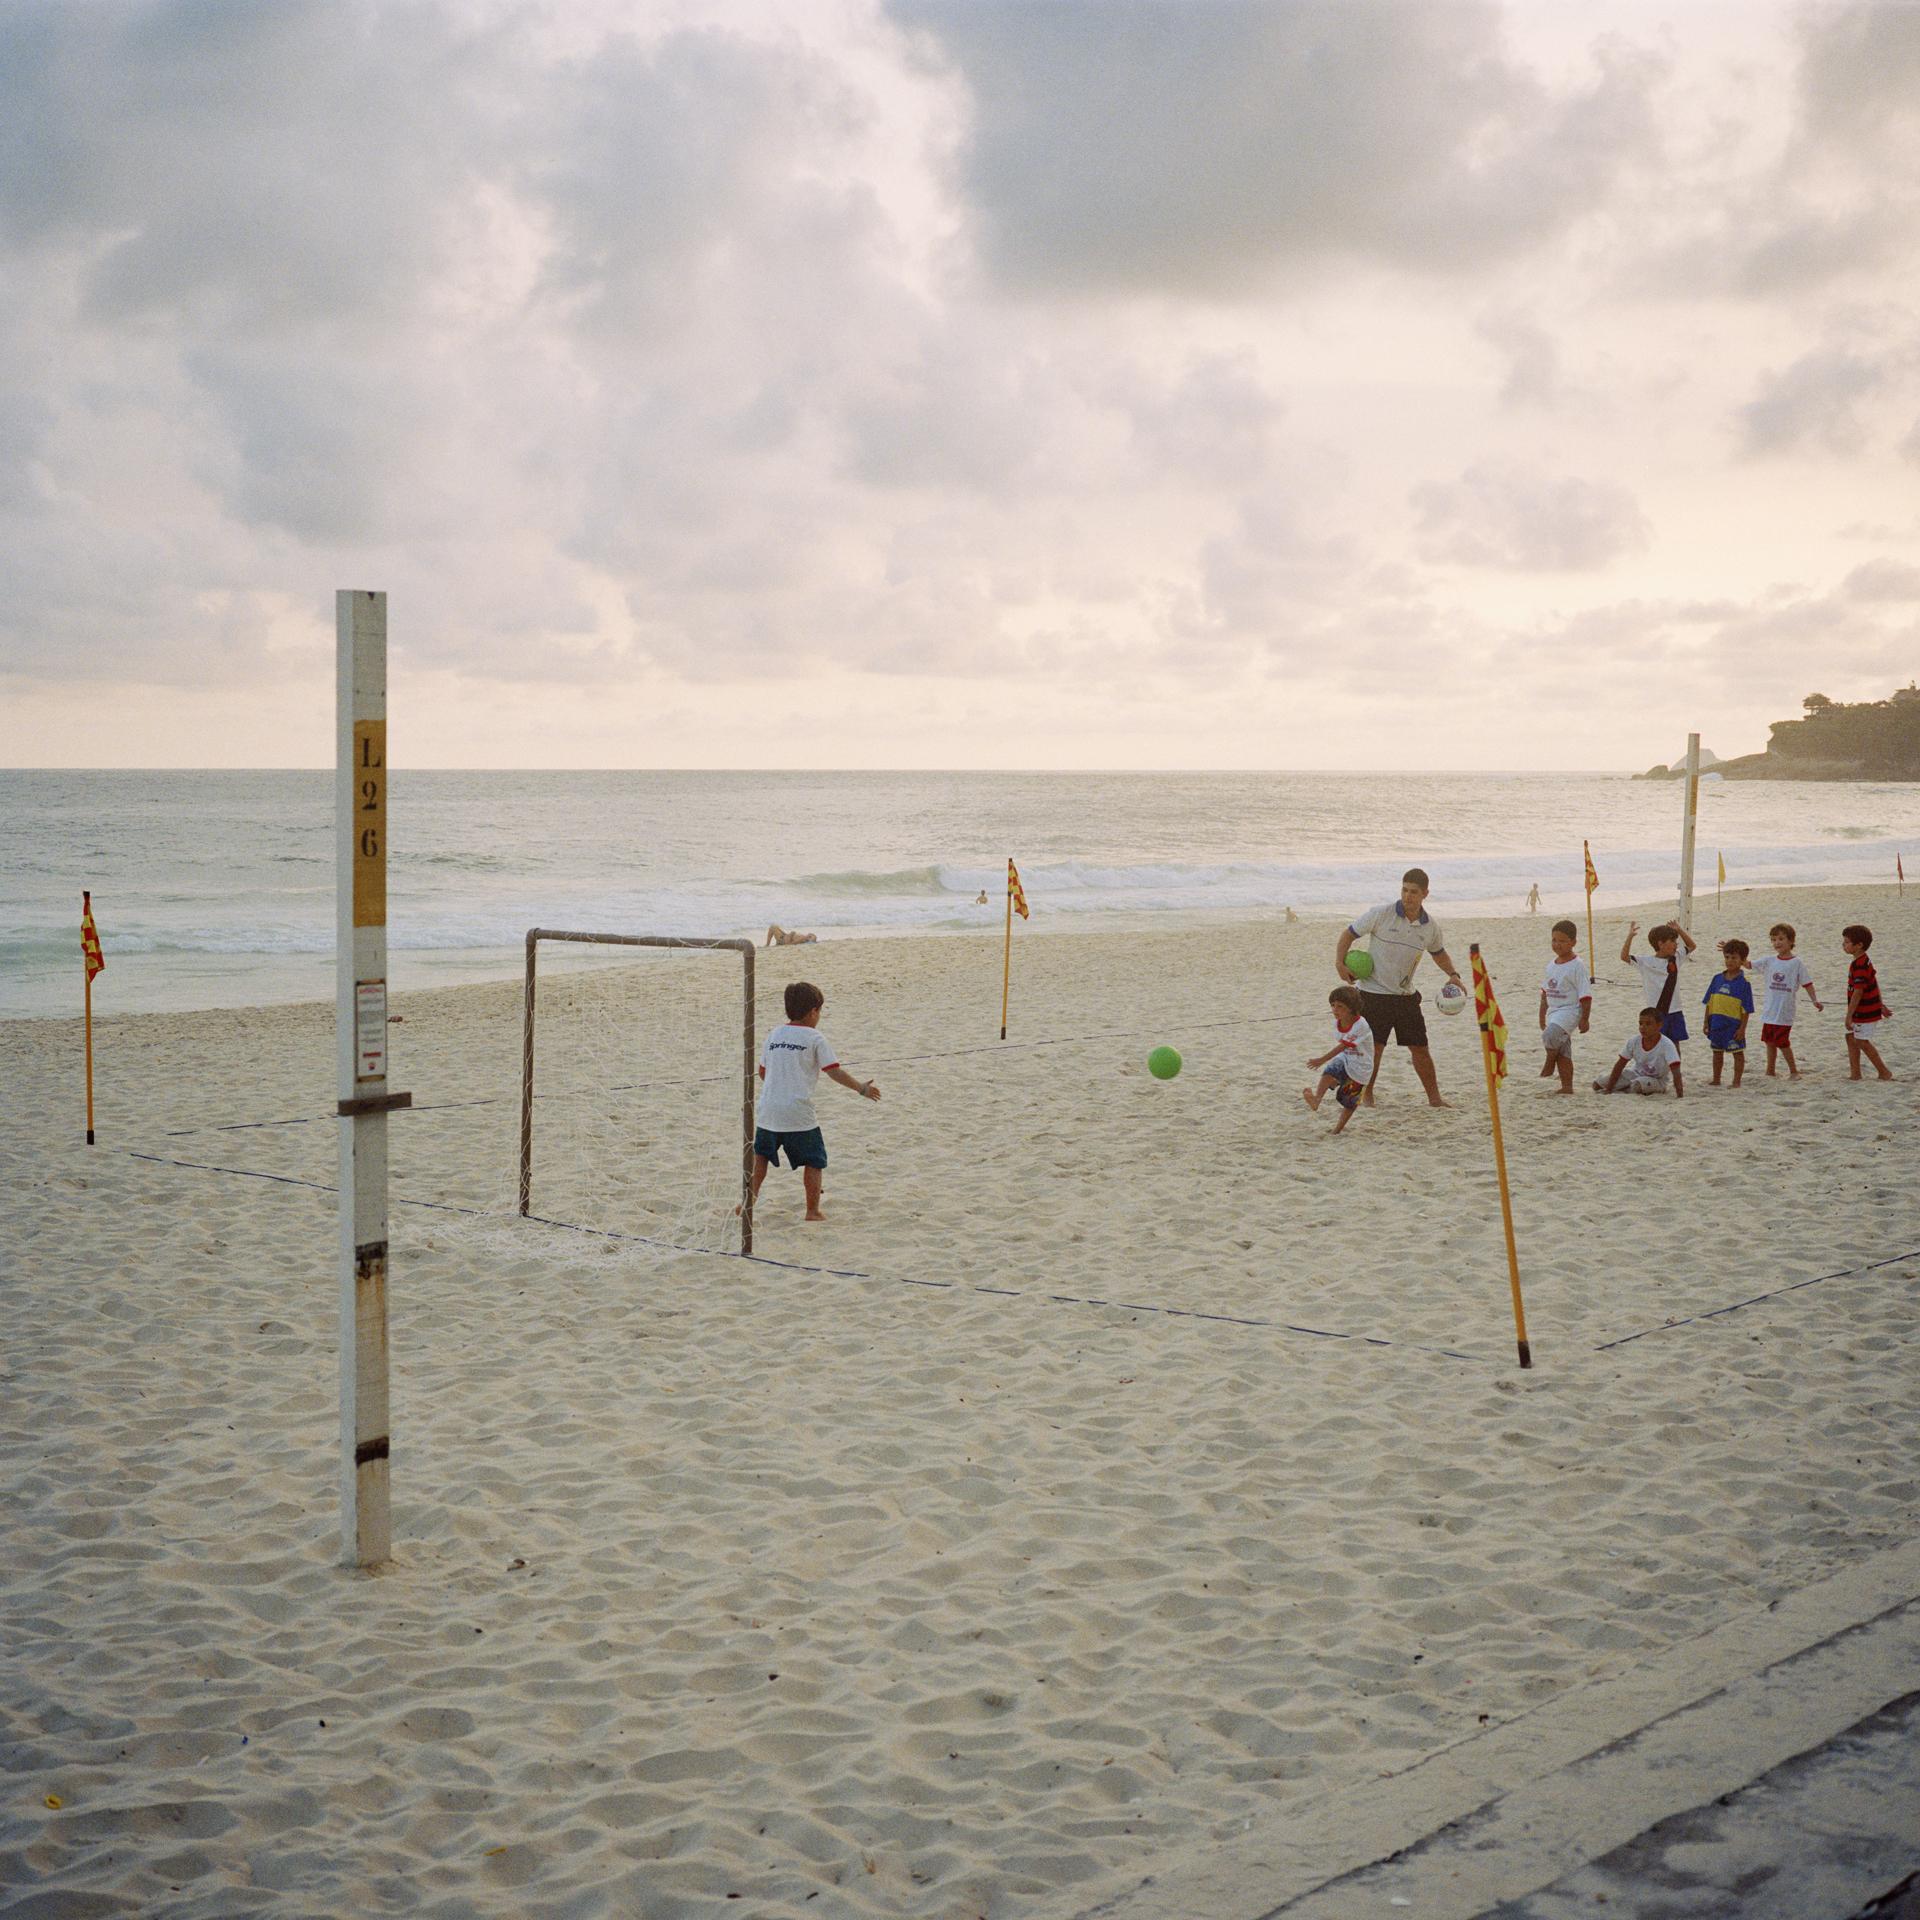 Ipanema Beach. Football practice.